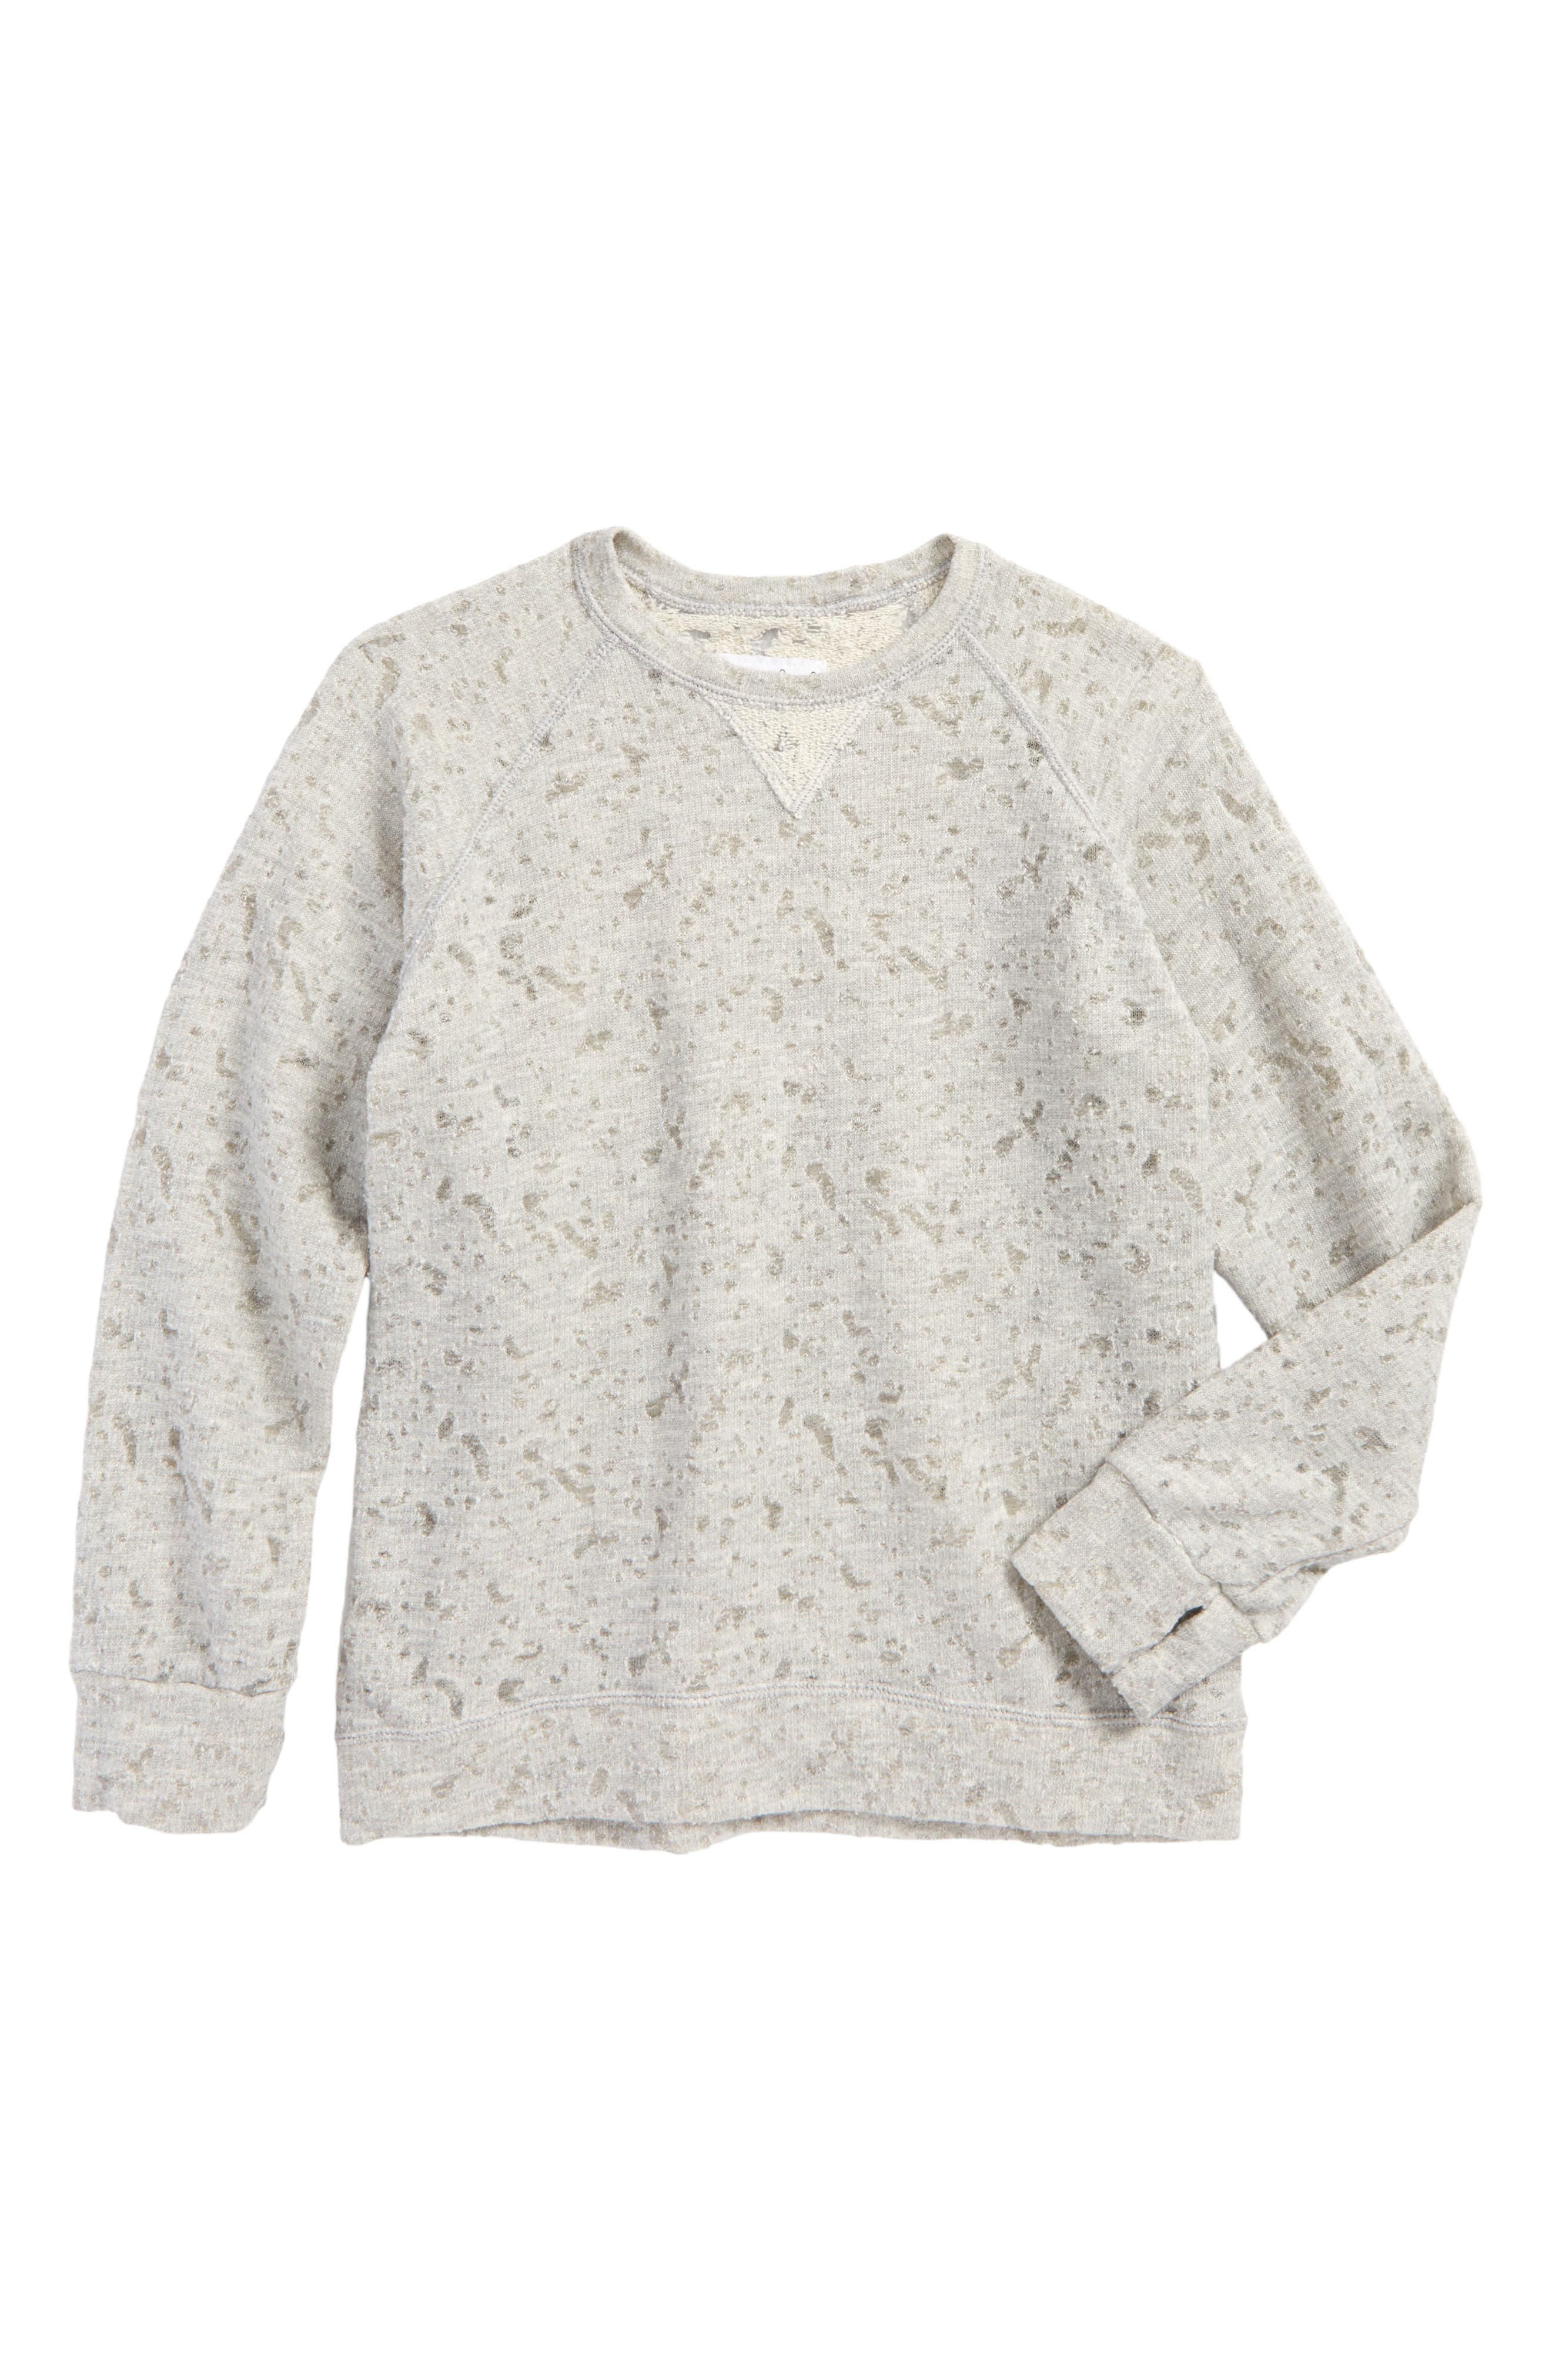 Main Image - NUNUNU Deconstructed Sweatshirt (Toddler Boys & Little Boys)